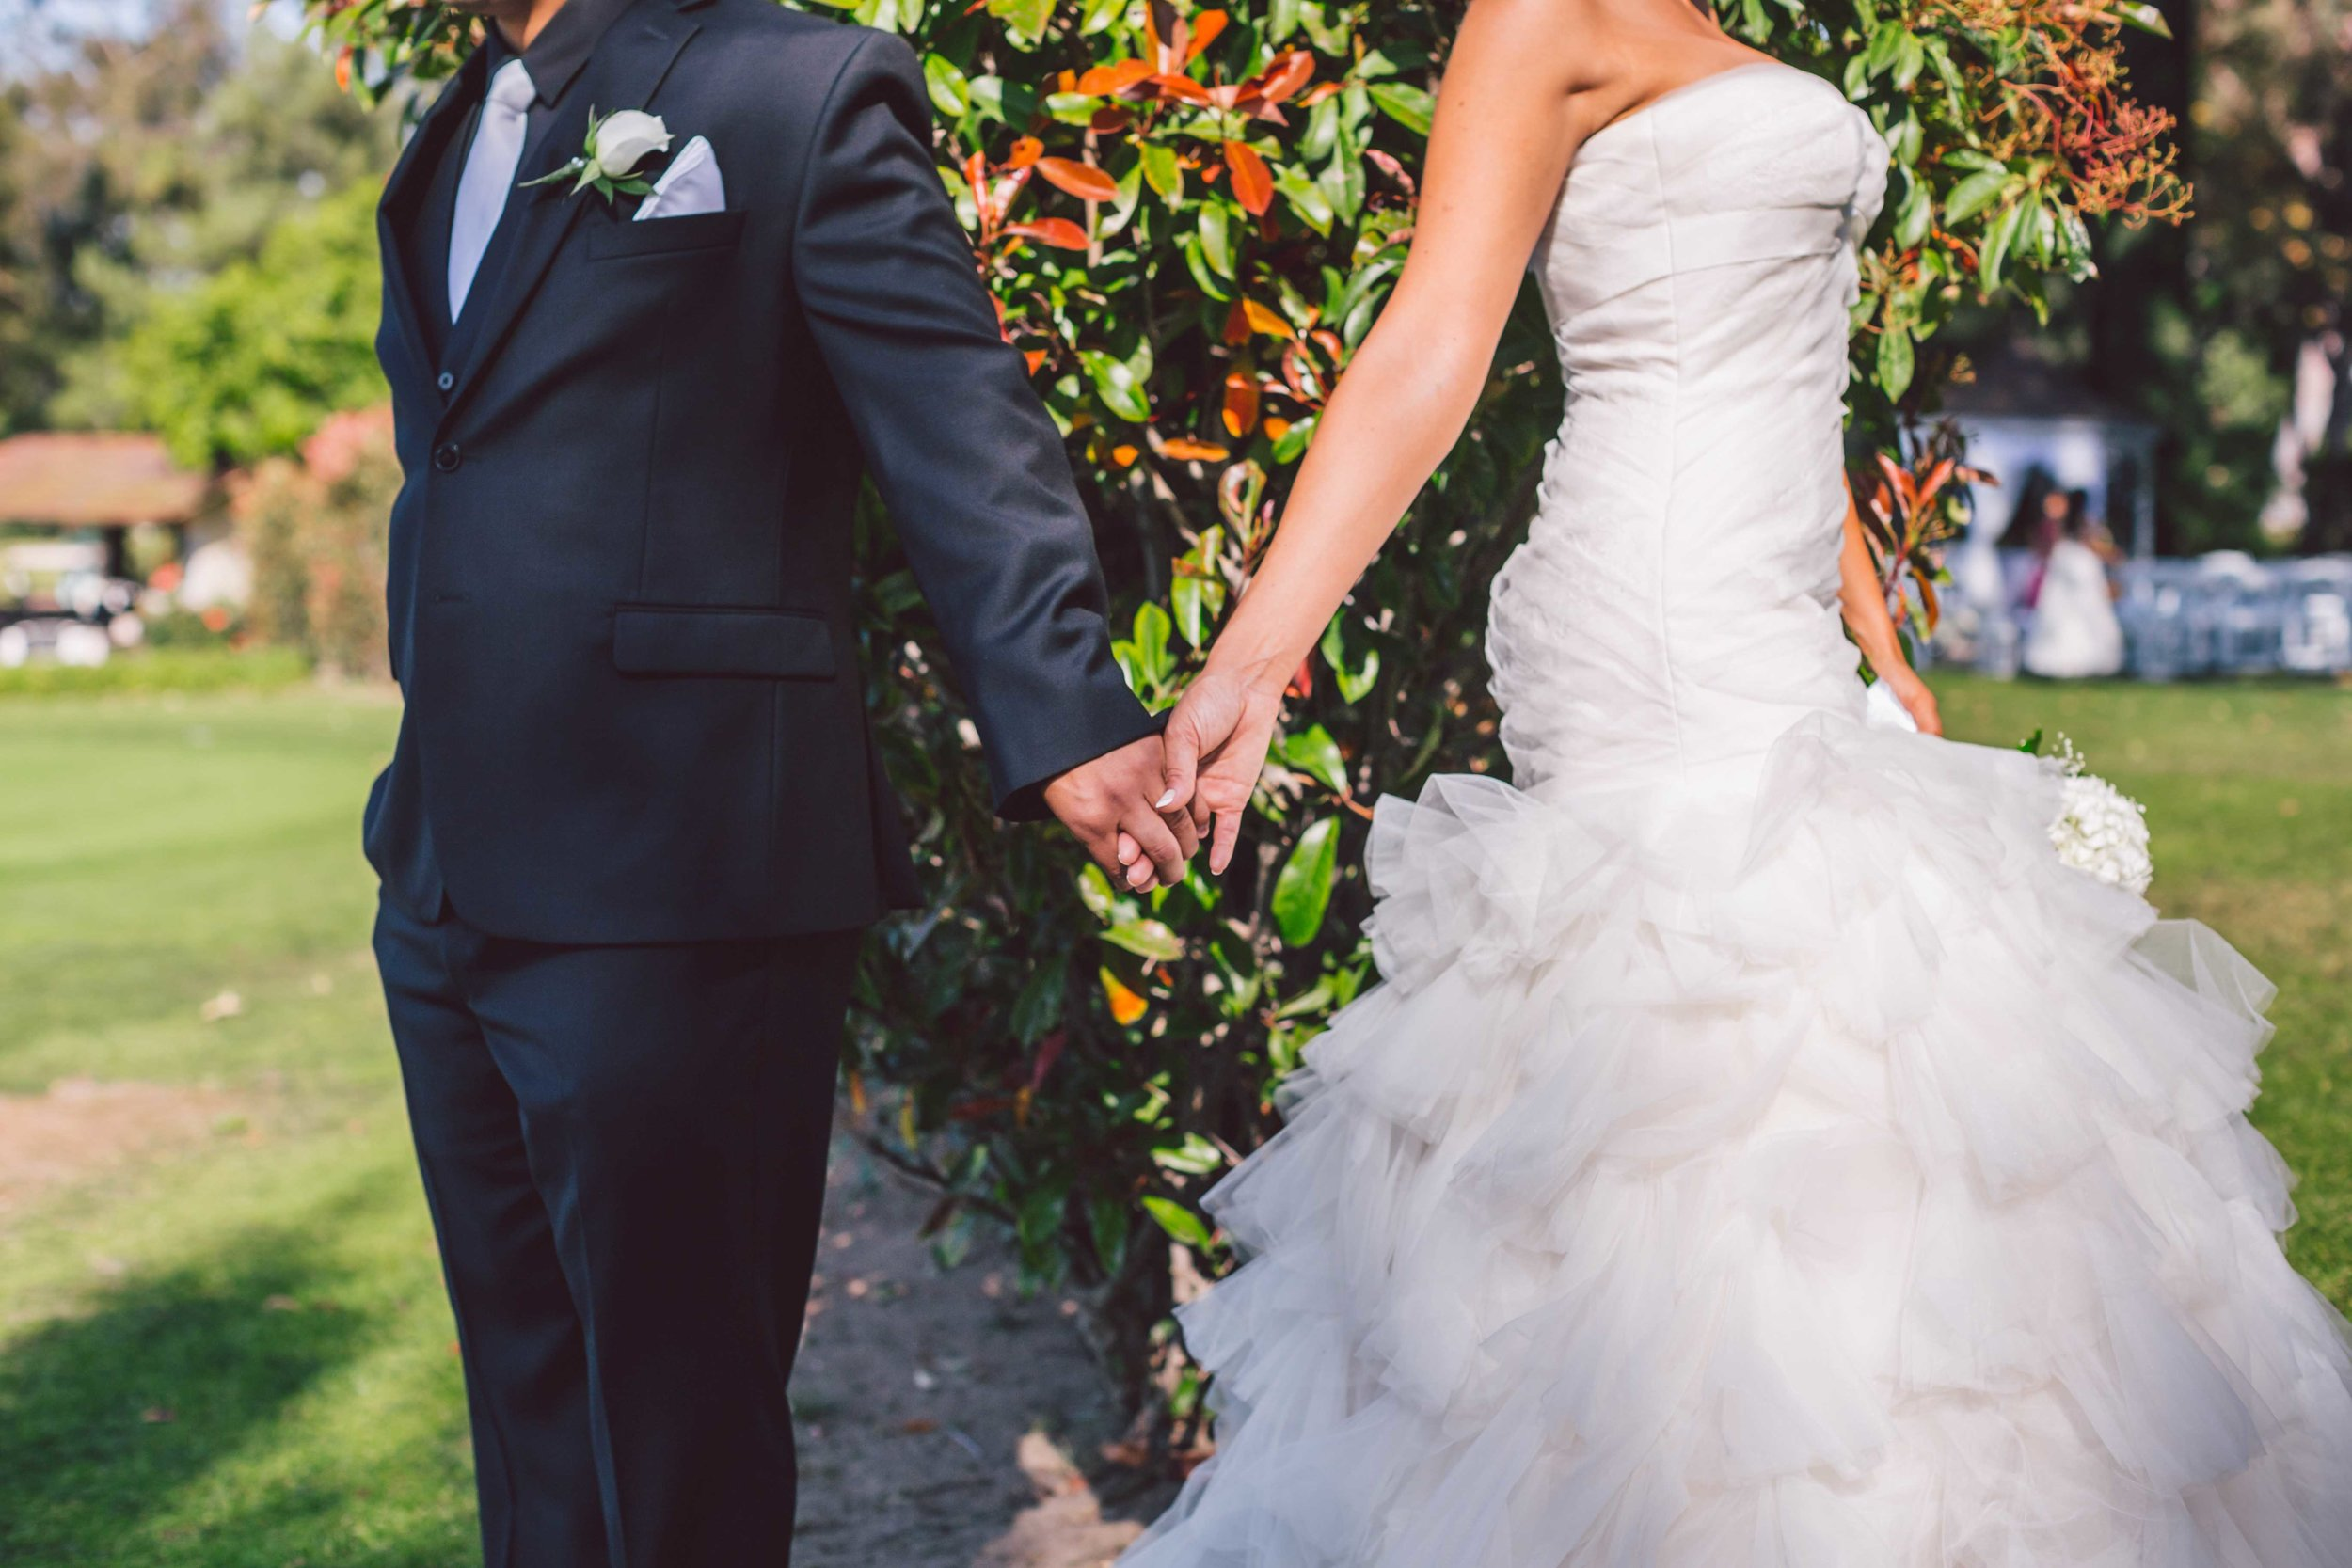 APavone-Photographer-Orange-County-Diamond-Bar-Wedding-040.jpg